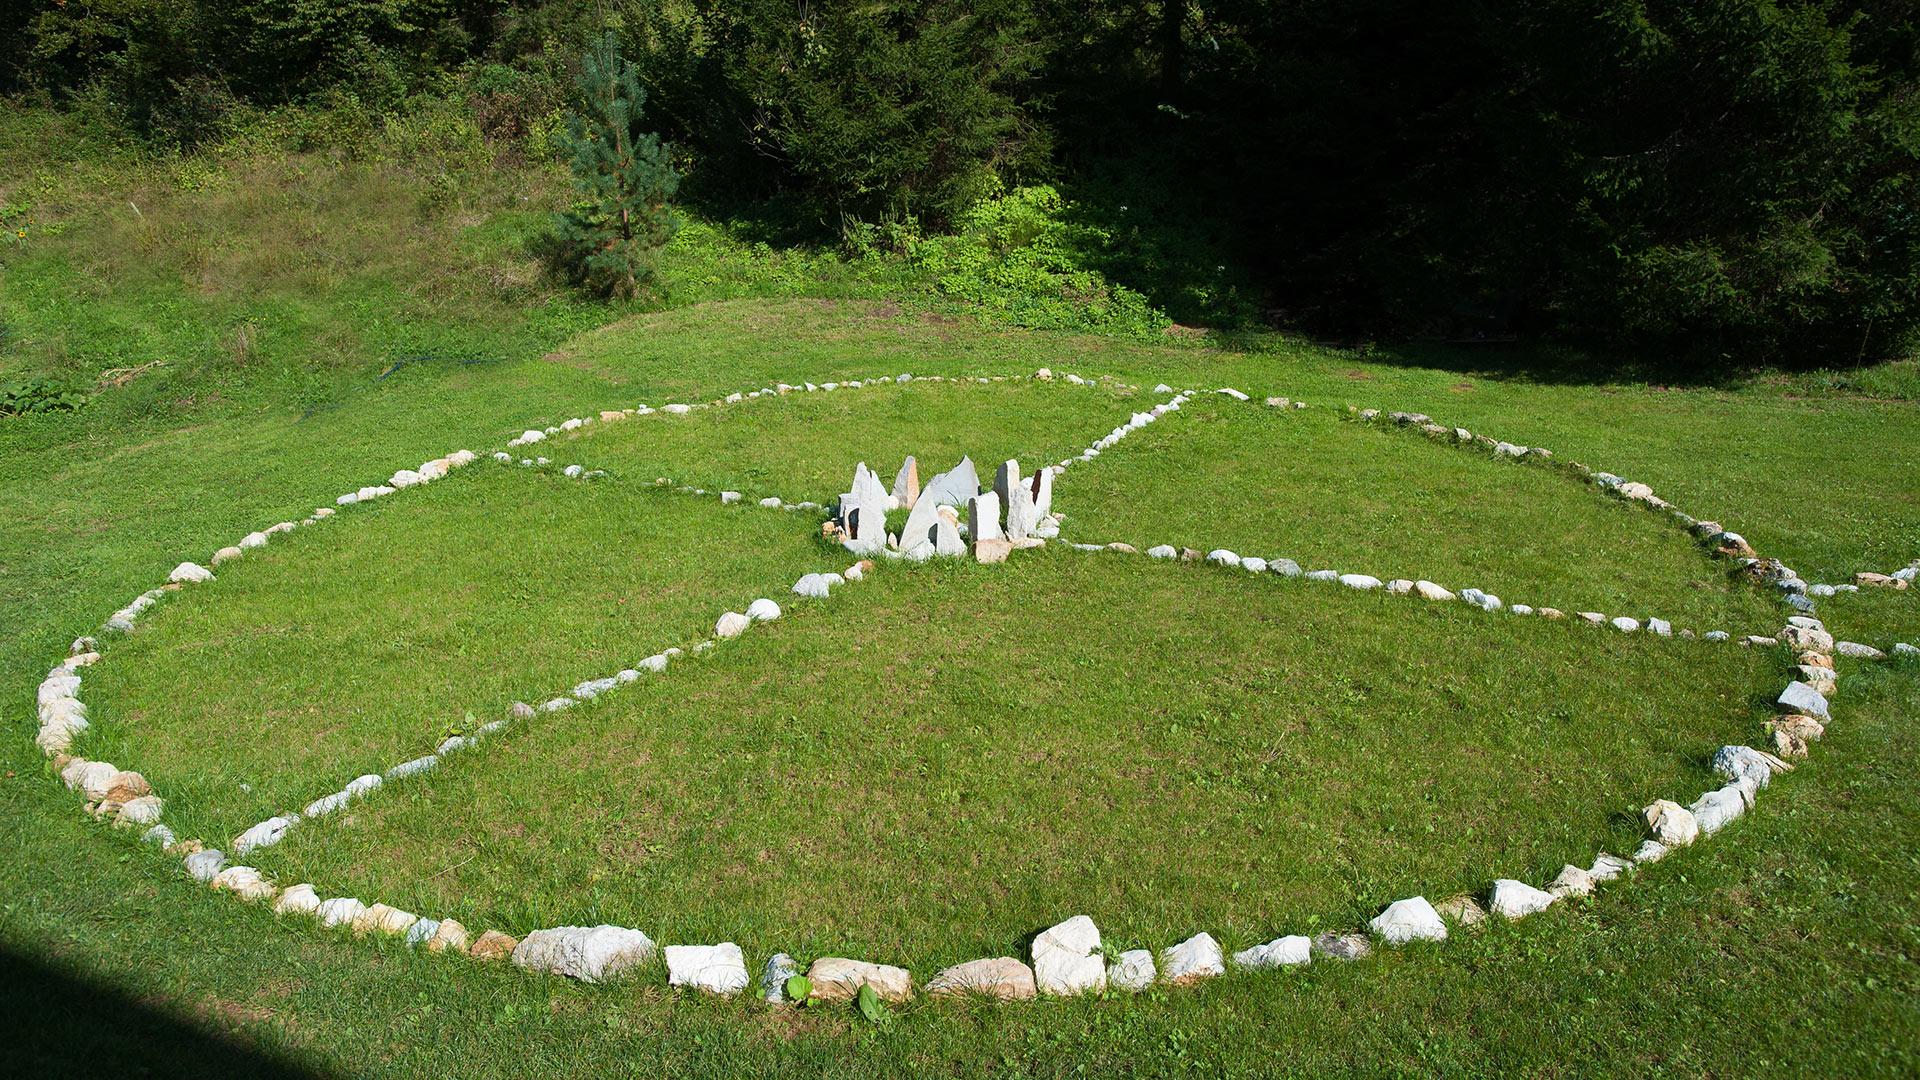 energijski park Manas, natural healing park, energijske točke